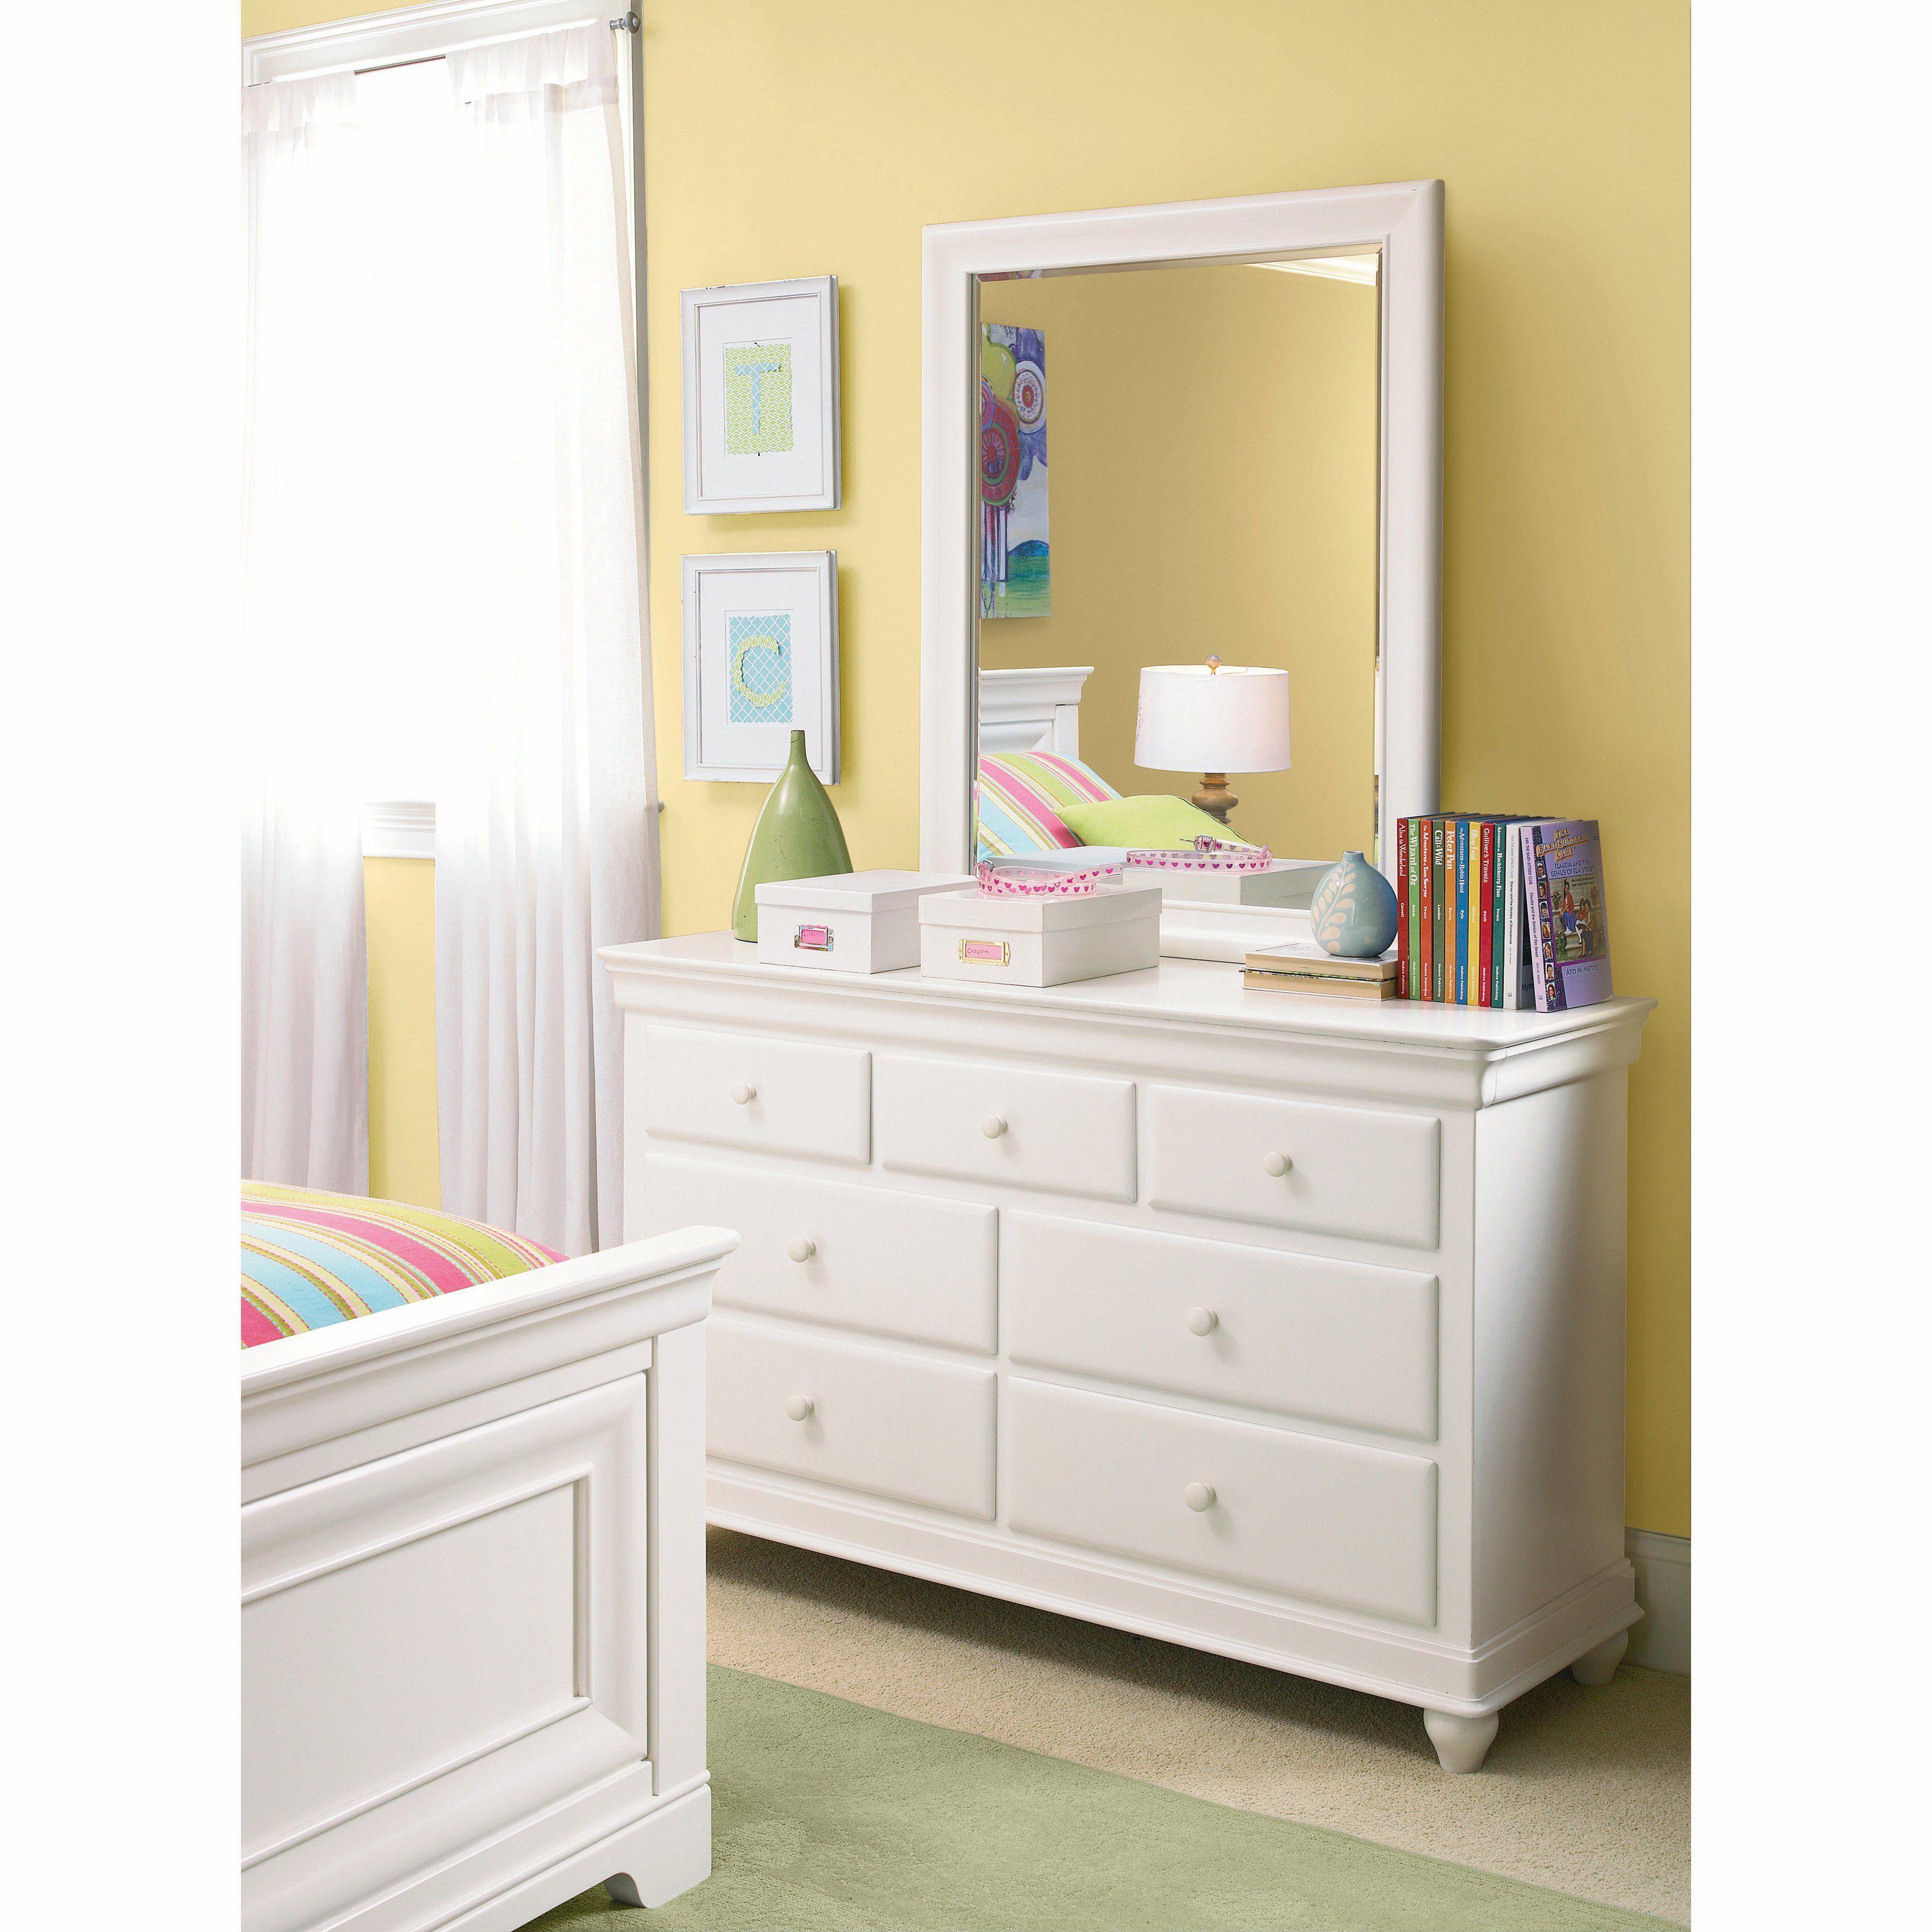 smartstuff Classics 4.0 Summer White 7 Drawer Dresser 7